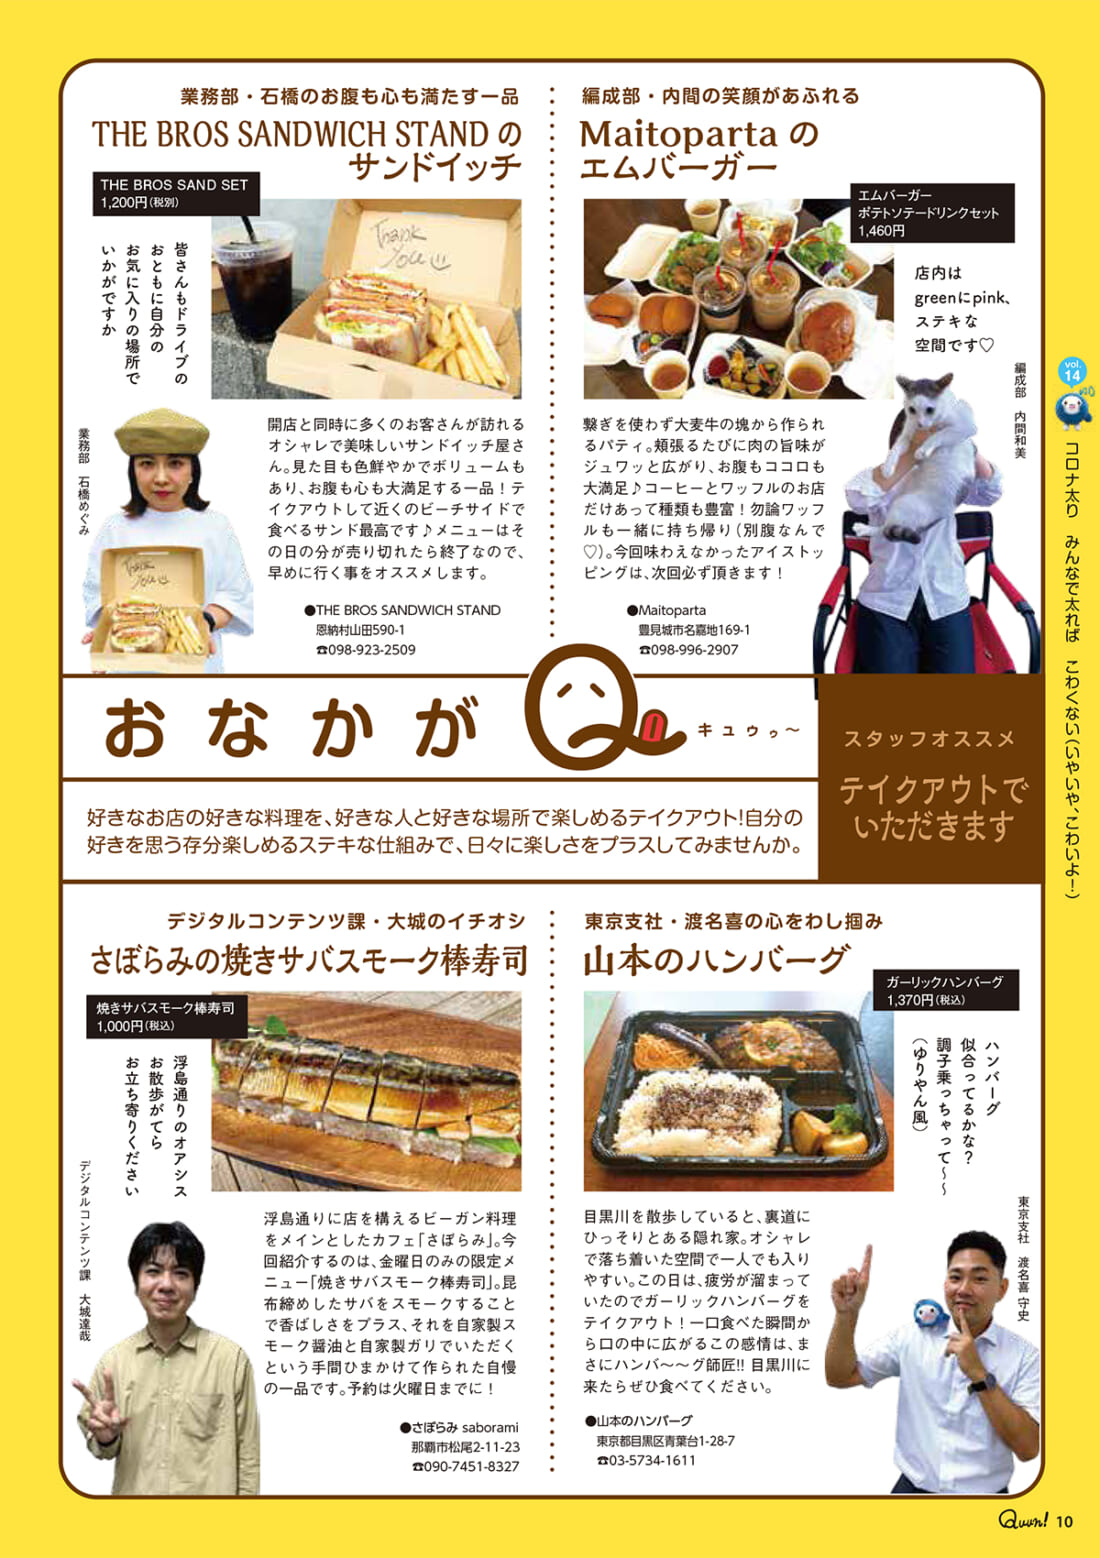 https://www.qab.co.jp/qgoro/wp-content/uploads/quun_1412-1100x1558.jpg